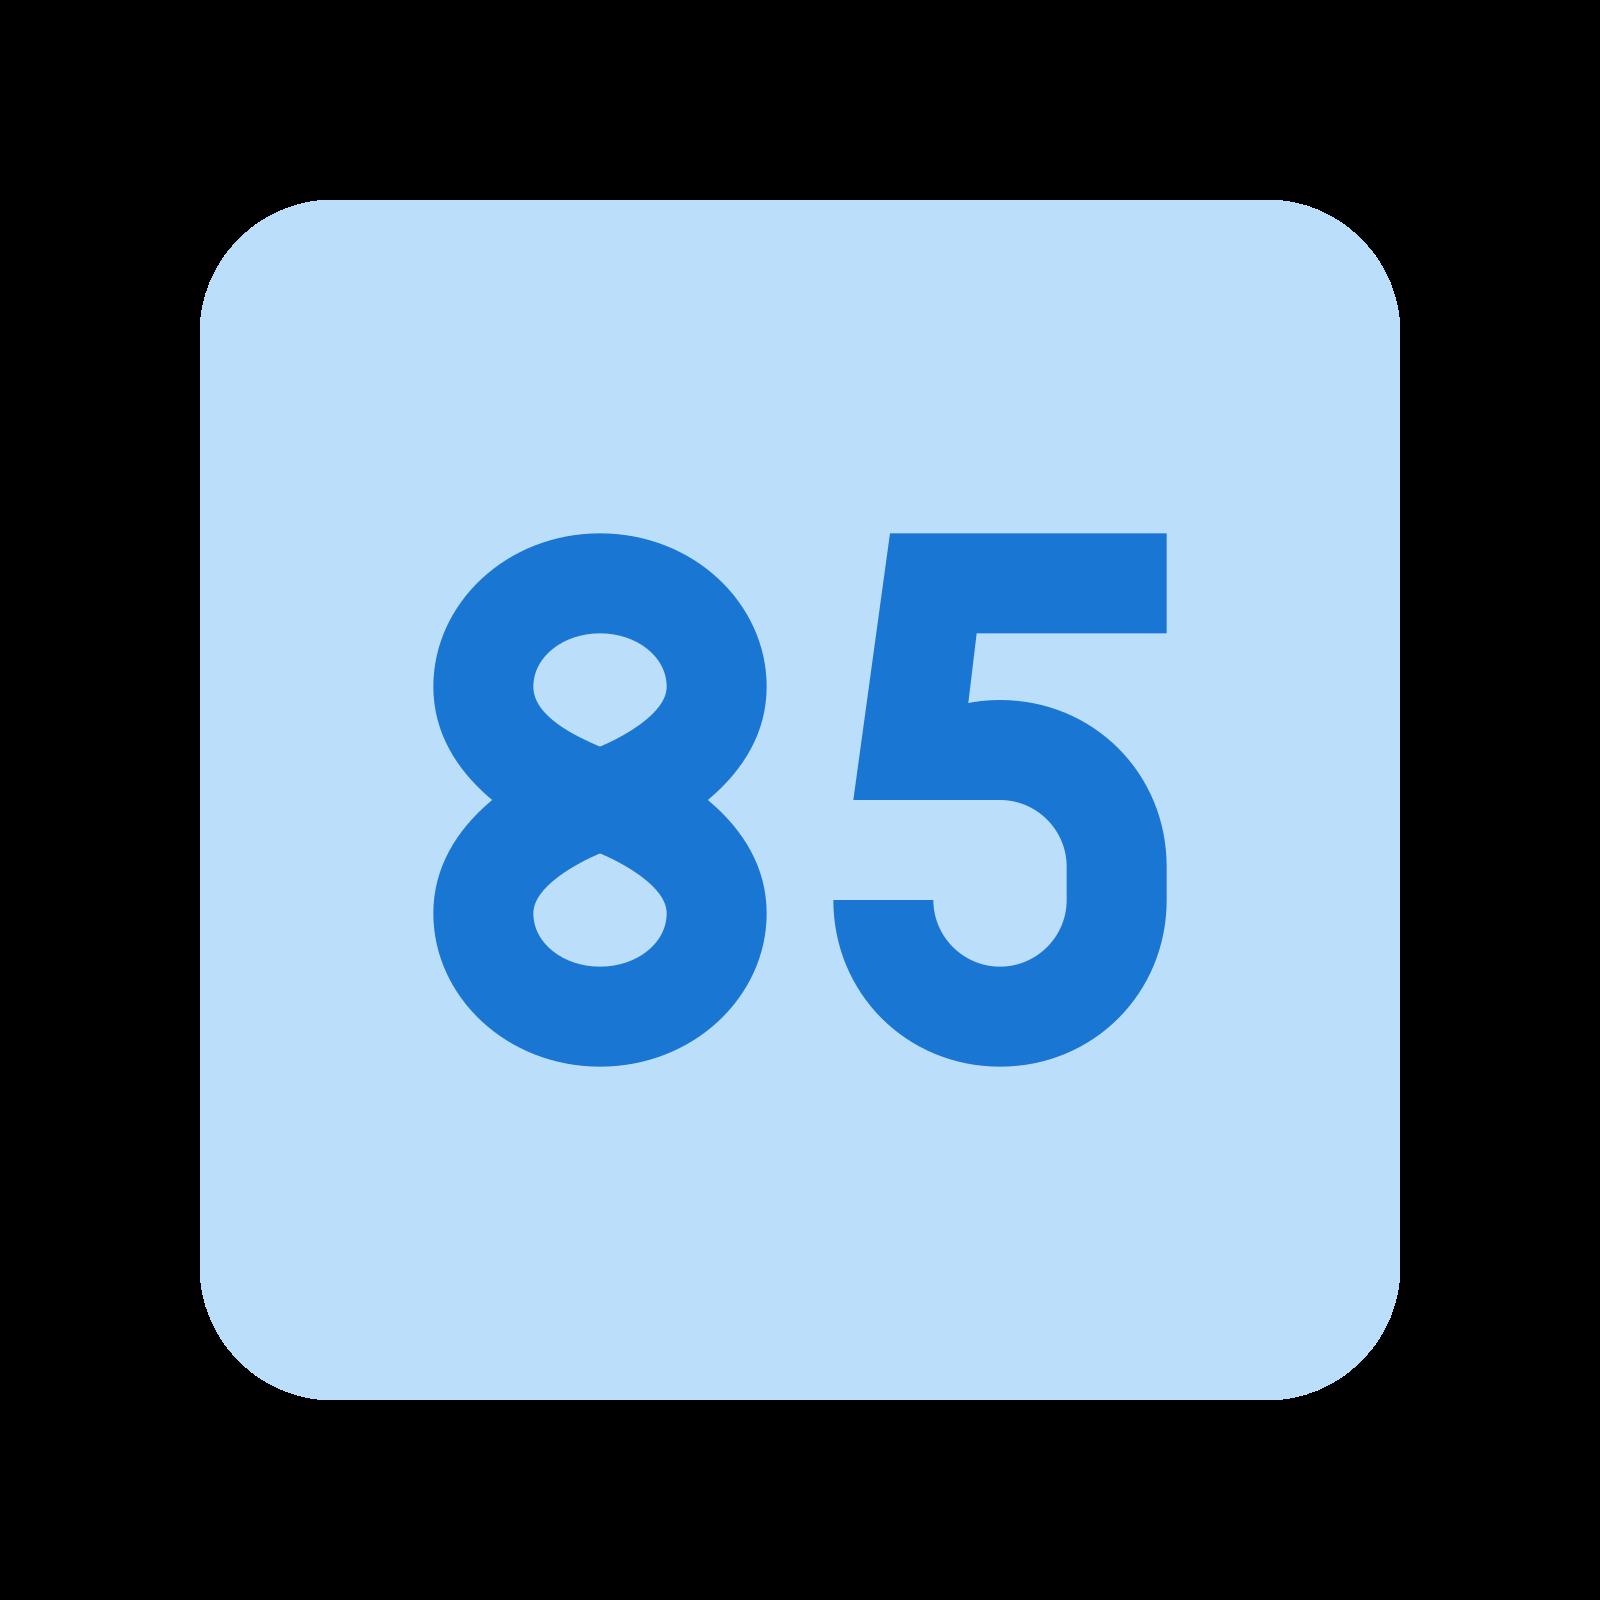 85 icon